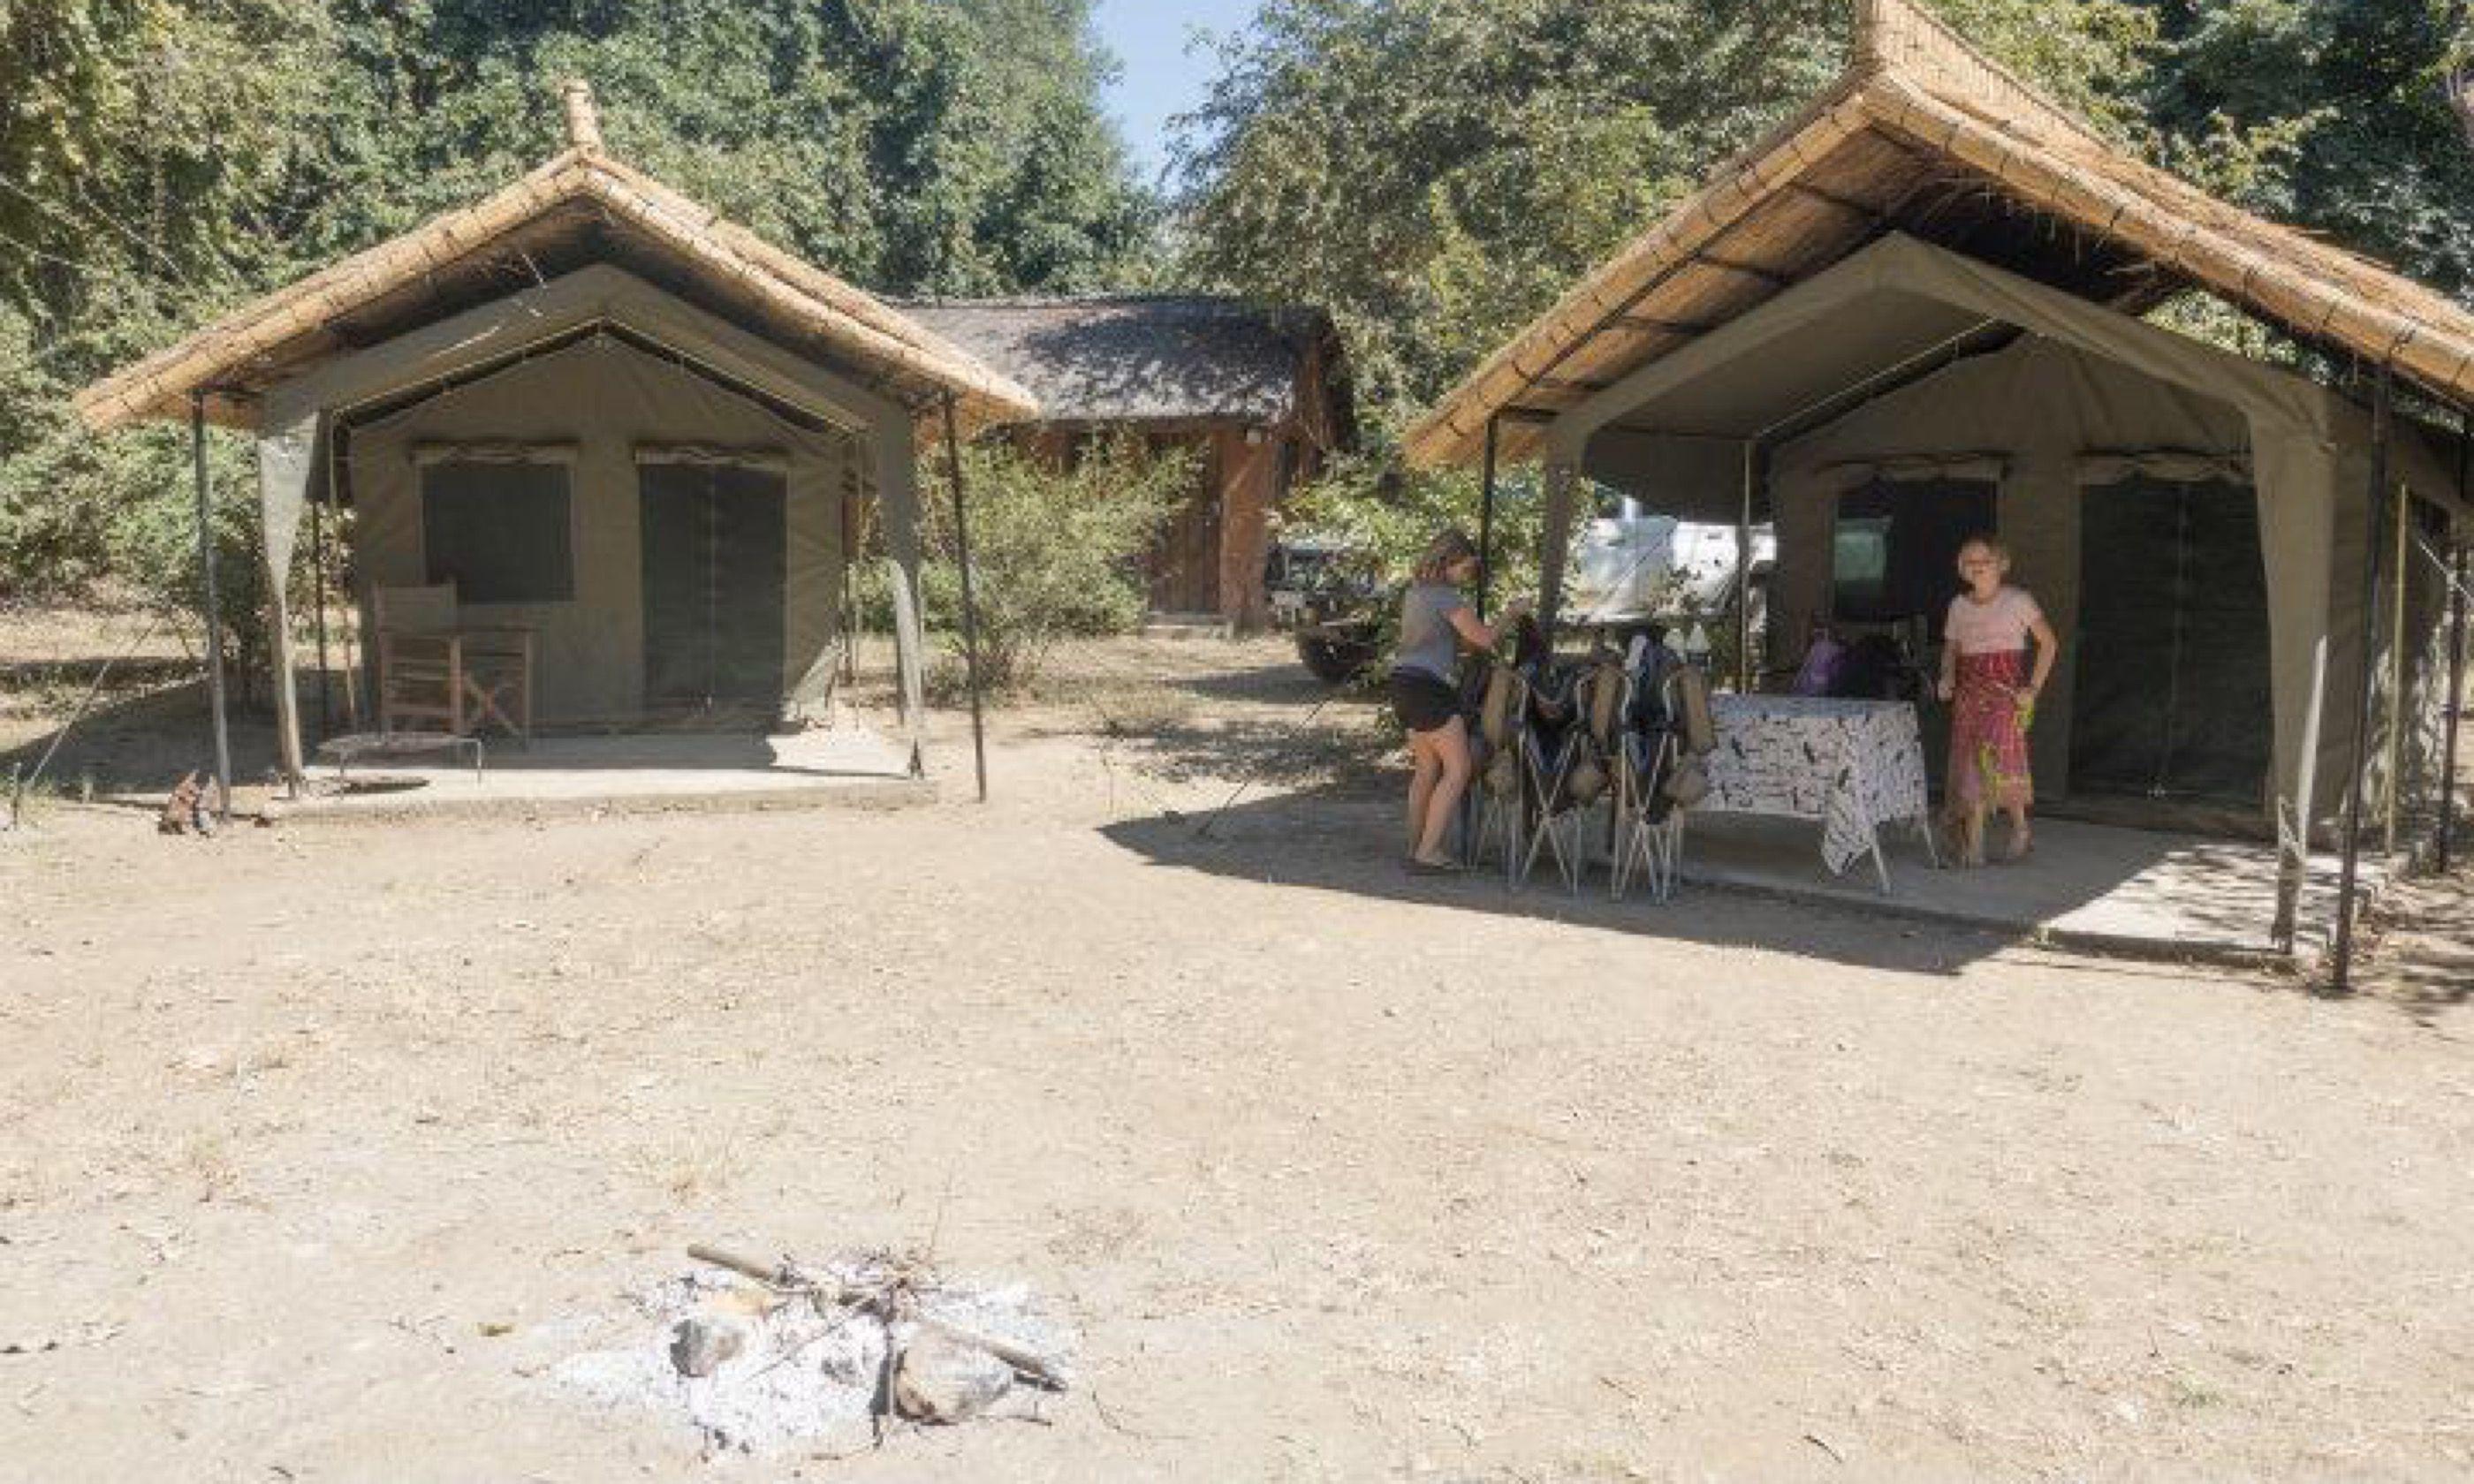 Croc Creek camp, Zambia (Edwina Cagol)